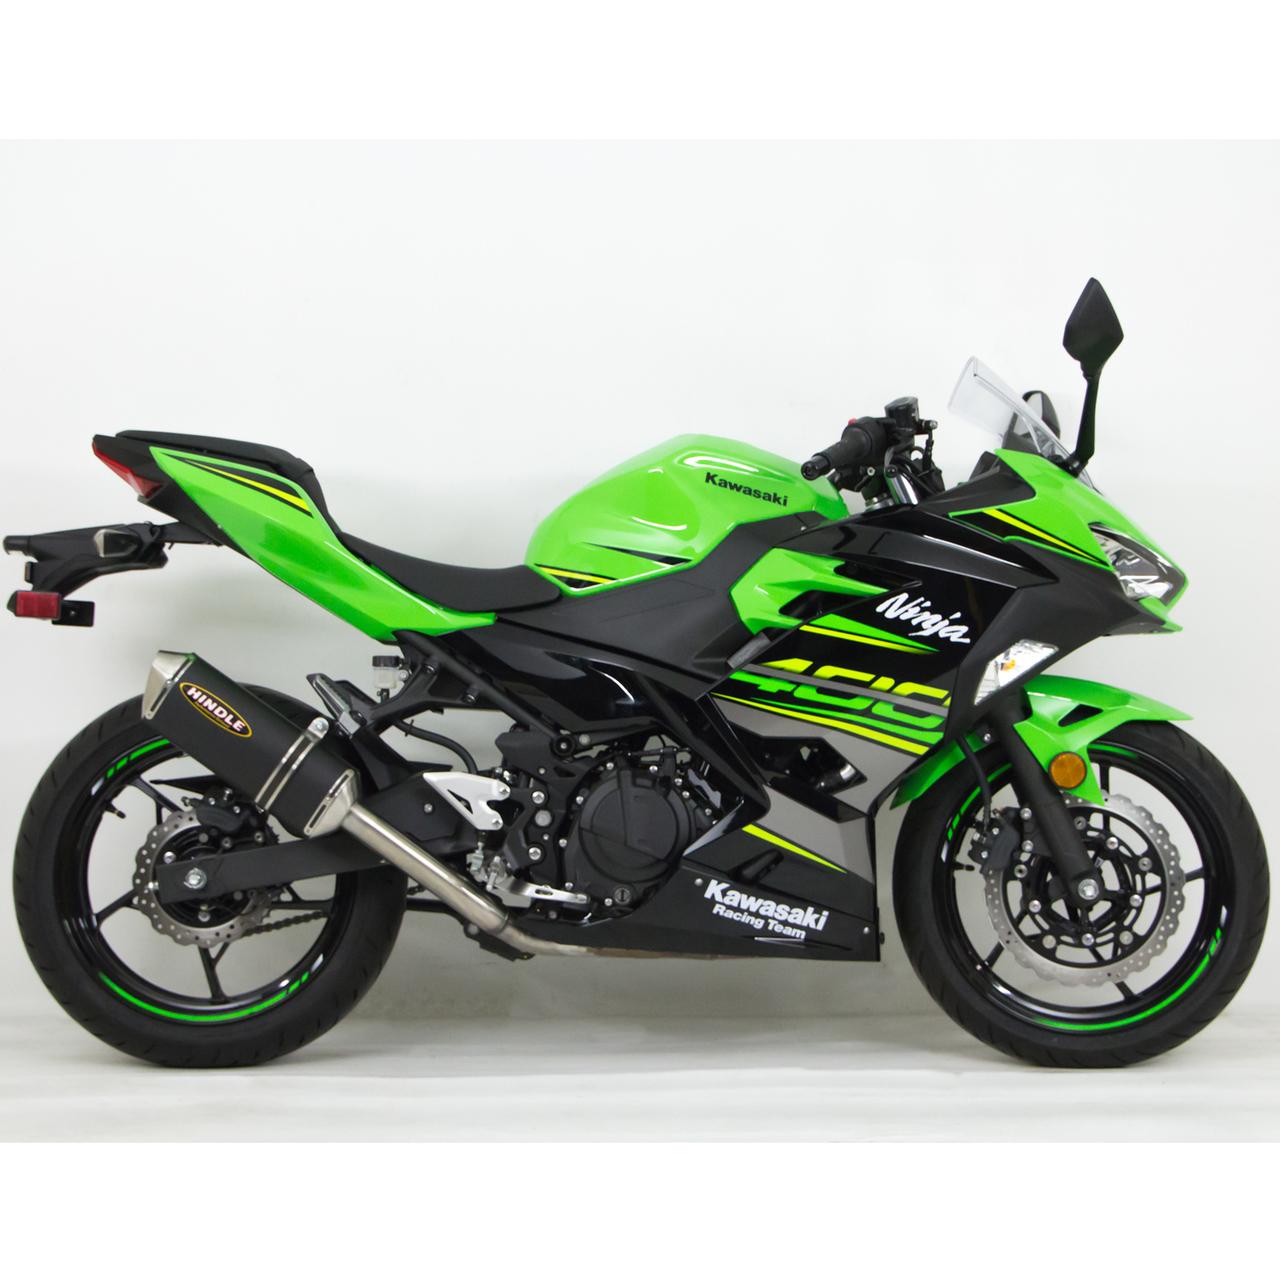 Hindle Kawasaki Ninja 400 18-19 EVO Full Exhaust System